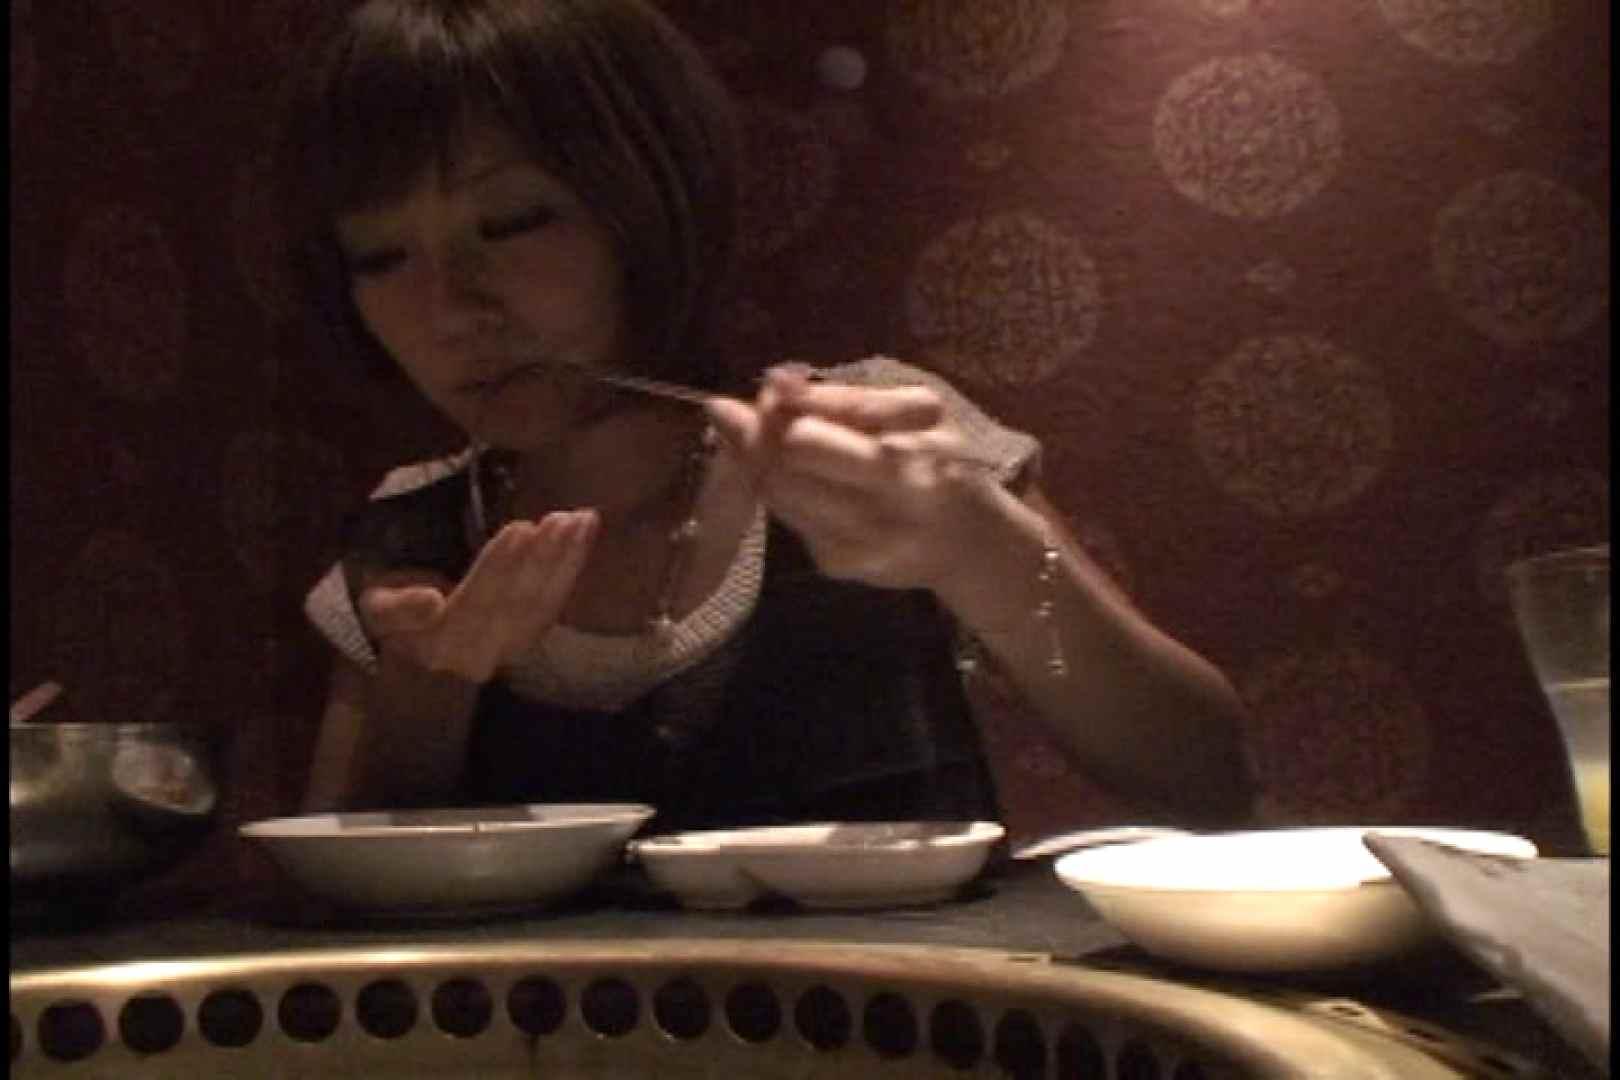 JDハンター全国ツアー vol.026 前編 女子大生のエロ生活   OLのエロ生活  104連発 57